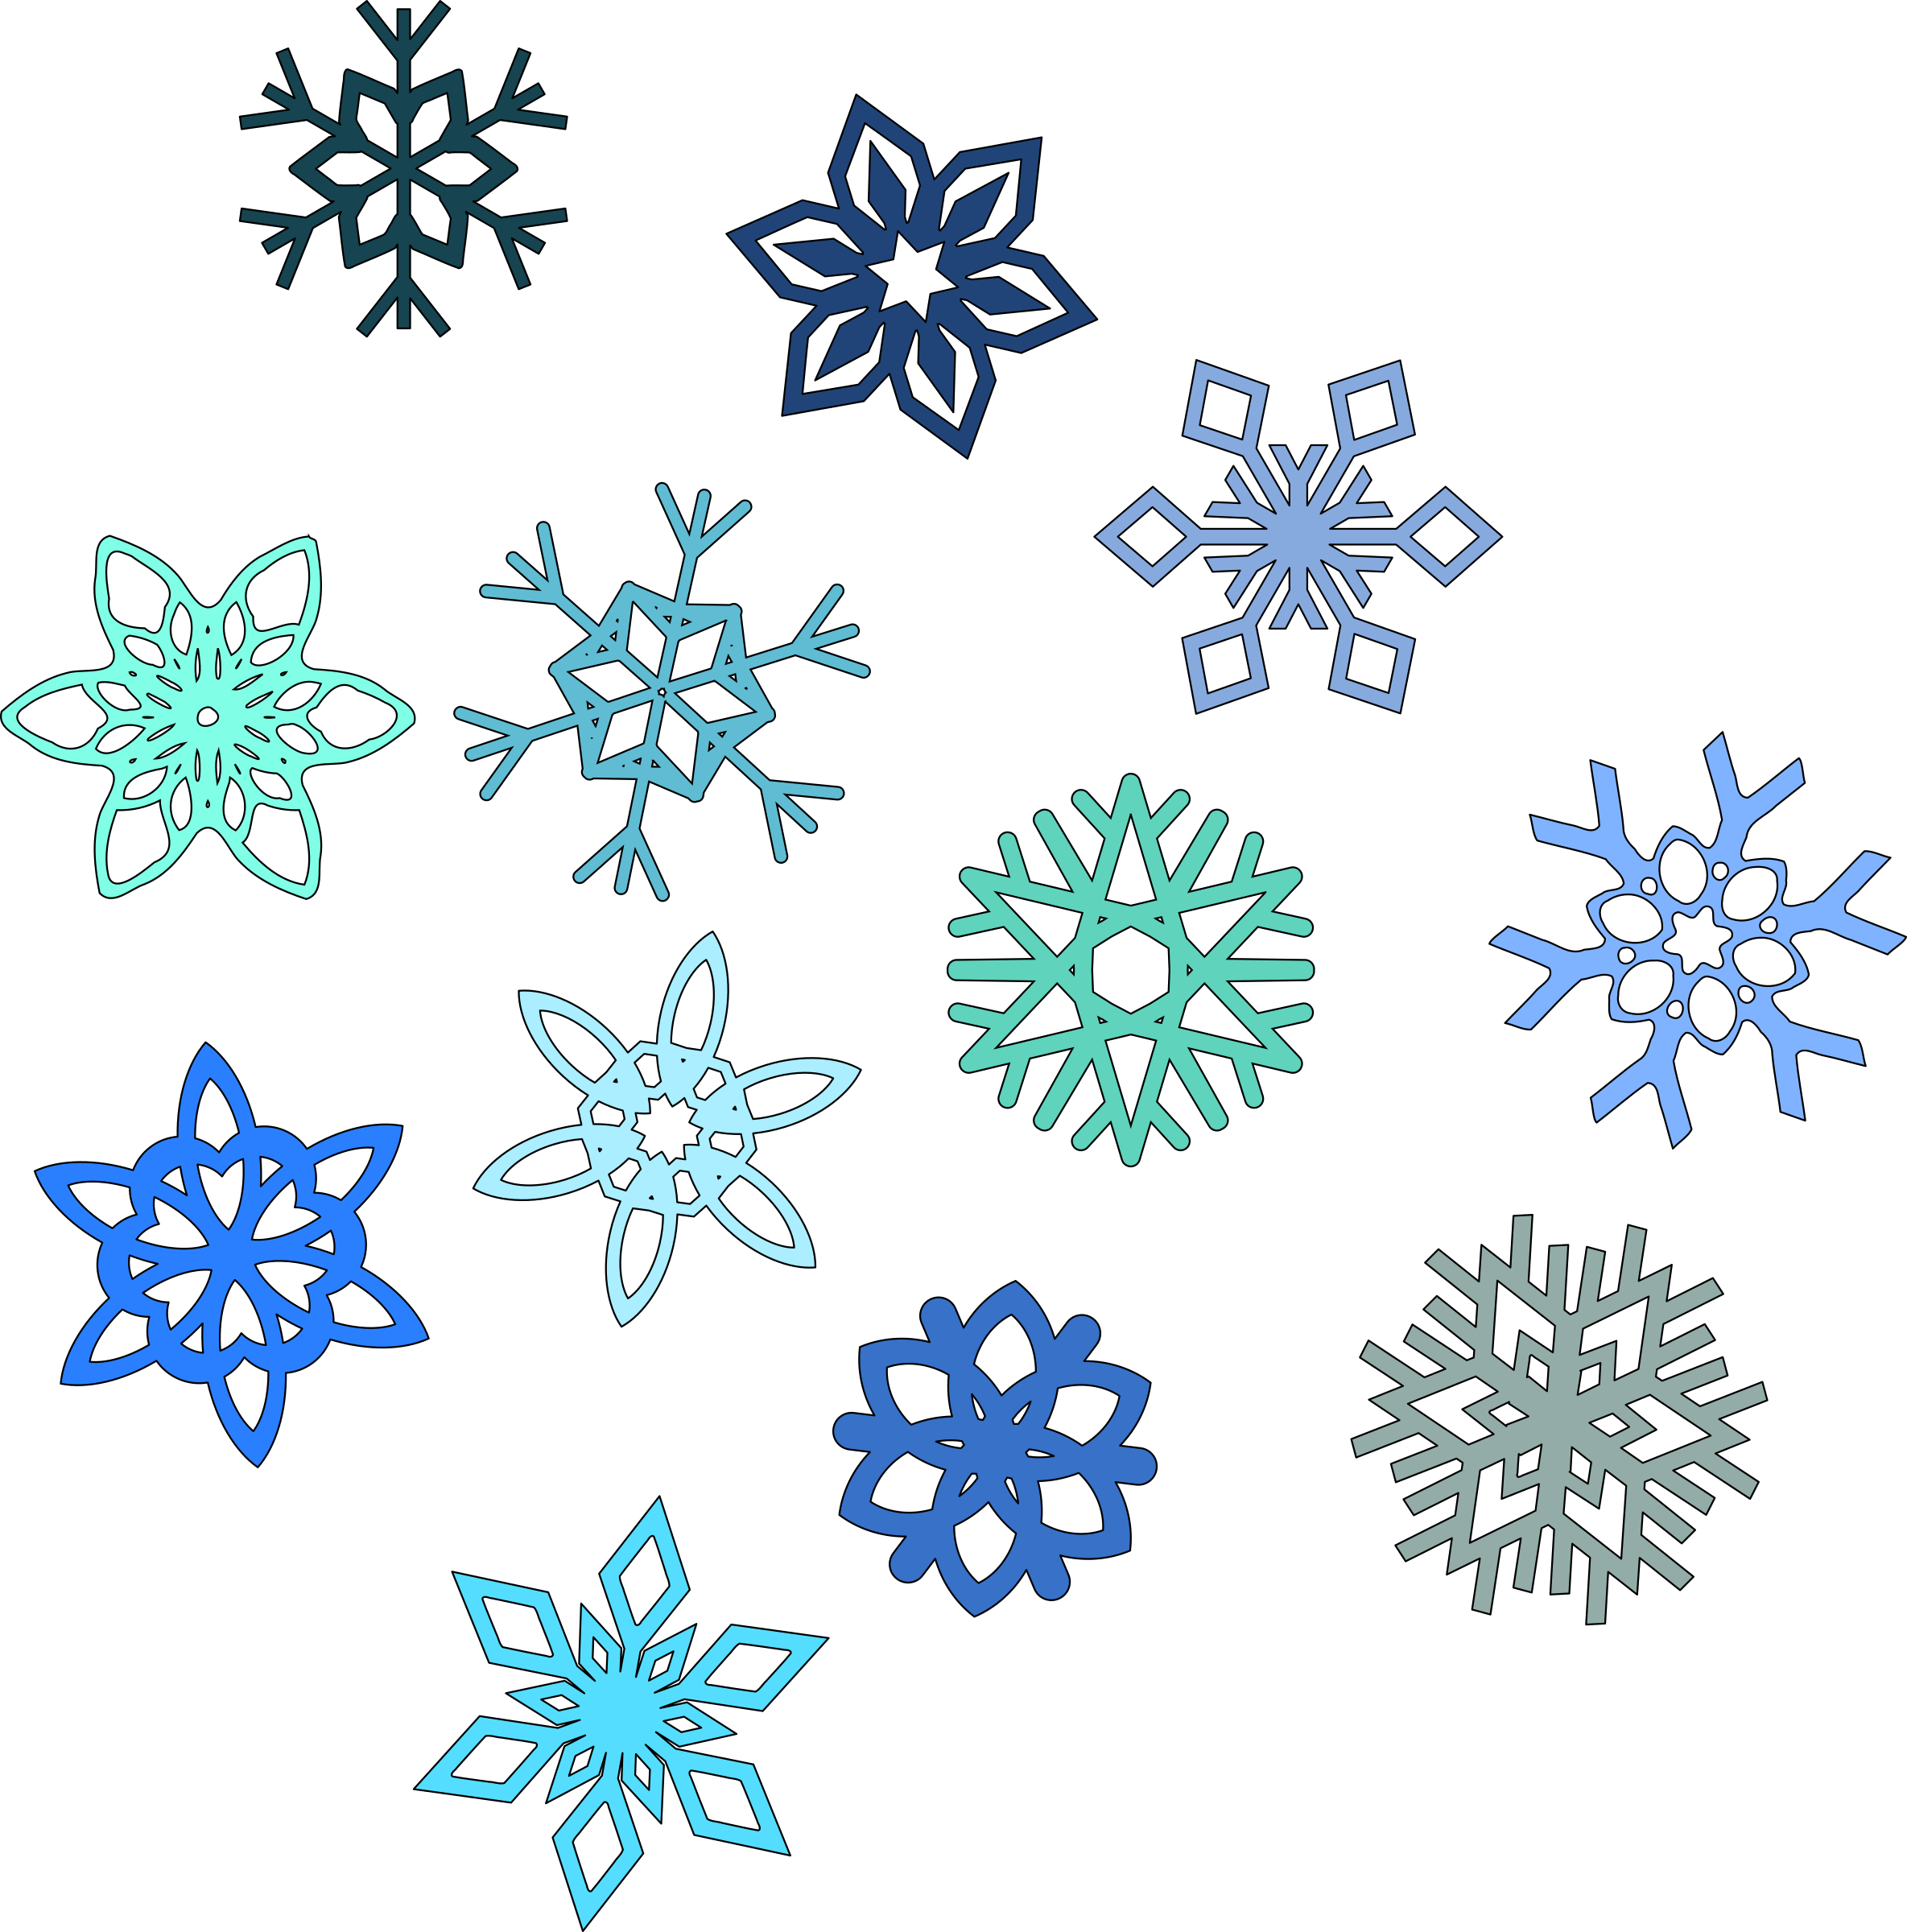 Snowflakes big image png. Frozen clipart snow